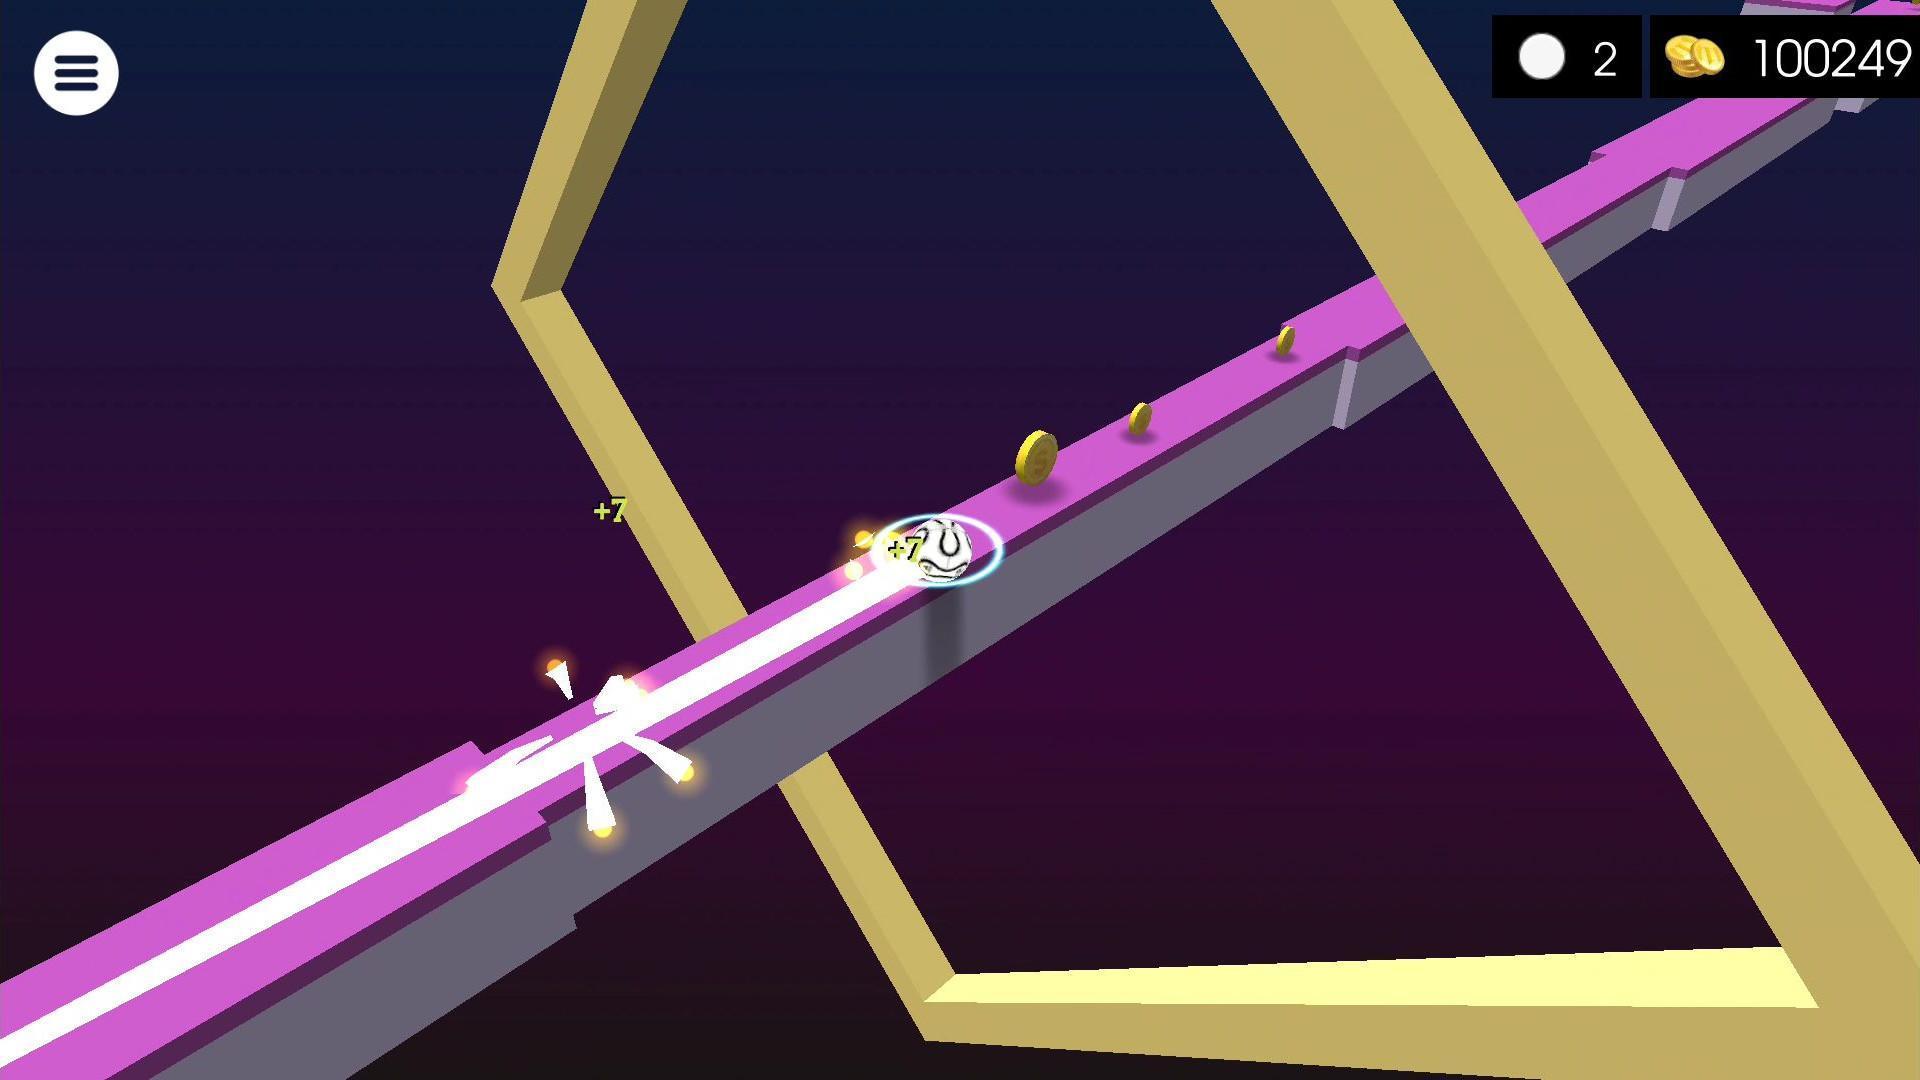 RYWO free 3D roll ball game 1.2.3 Screenshot 11